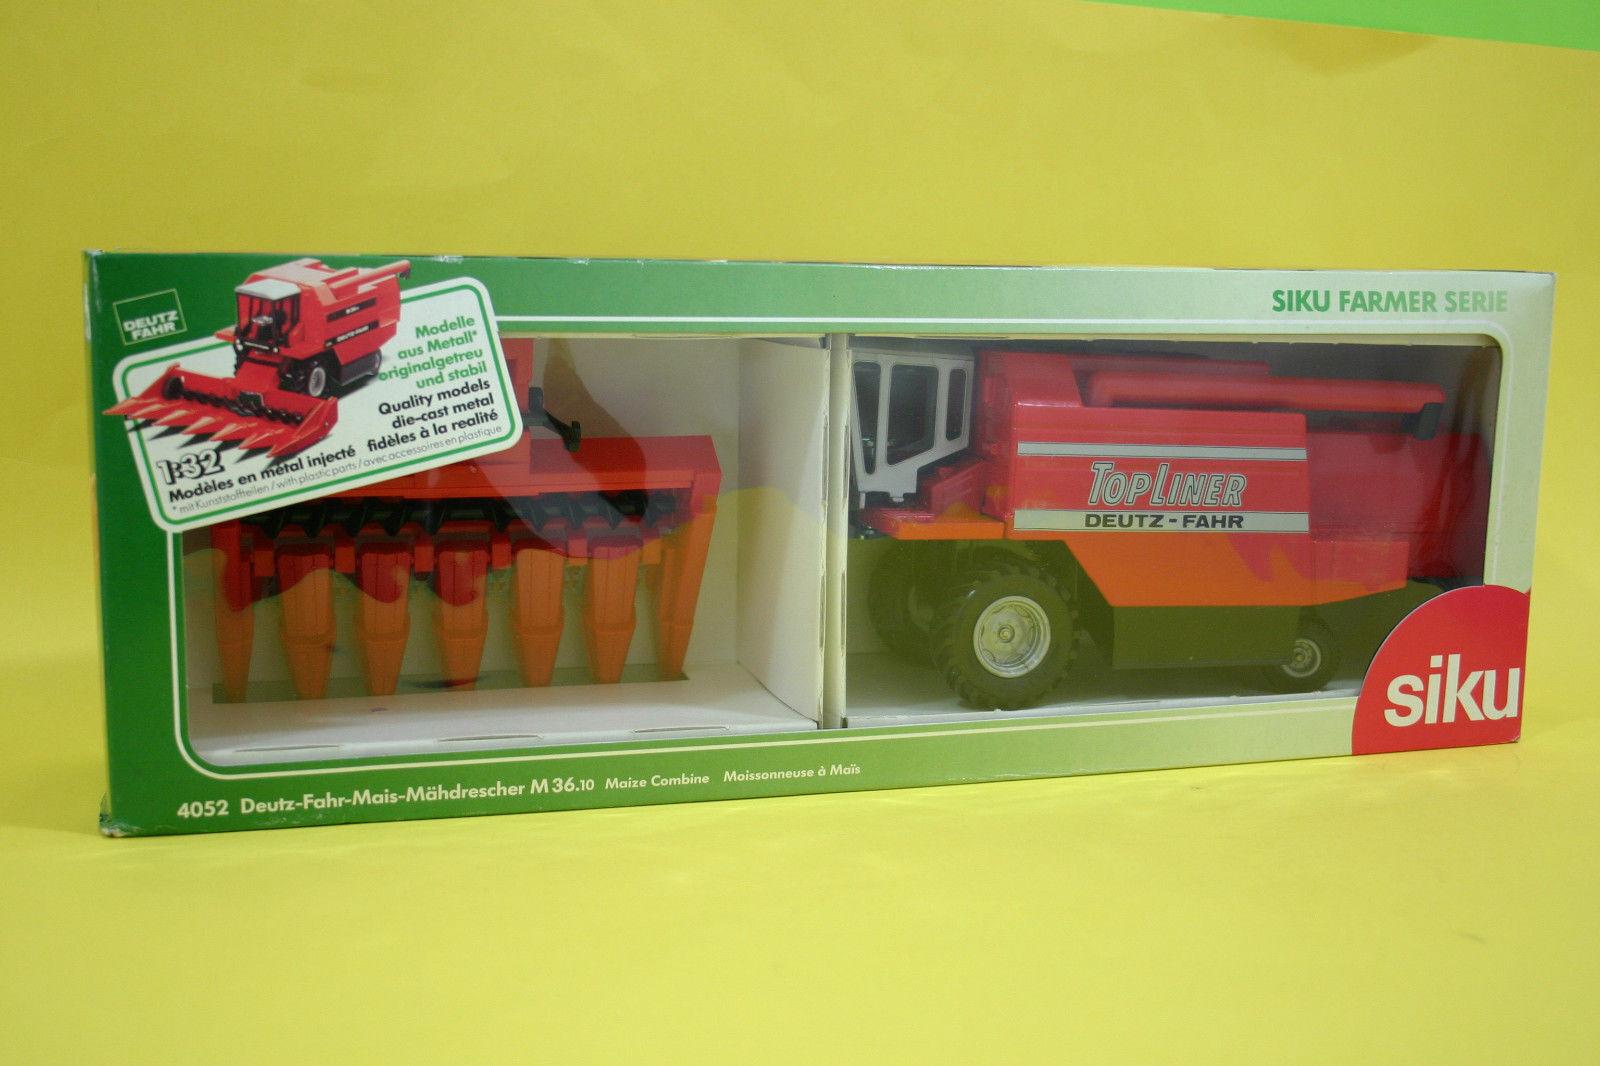 Deutz Fahr tracteur HARVESTER M 36.10 SIKU 4052 Top Liner Farmer Farm Toy 1 32